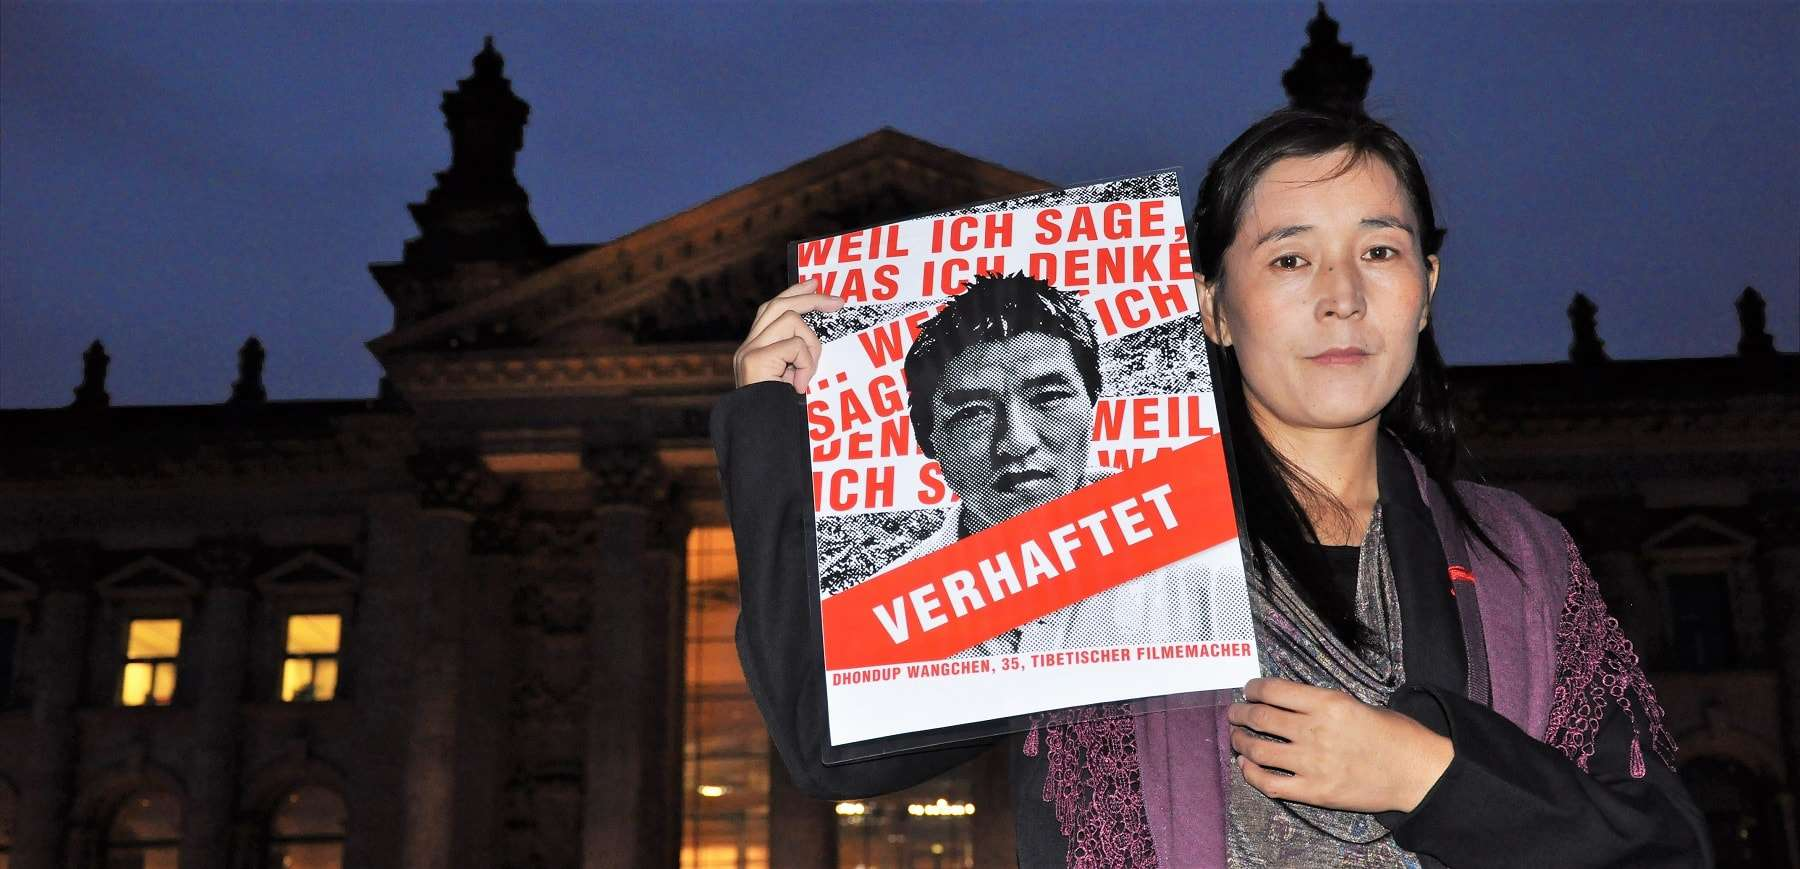 Lhamo Tso, Dhondup Wangchens Ehefrau vor dem Brandenburger Tor in Berlin